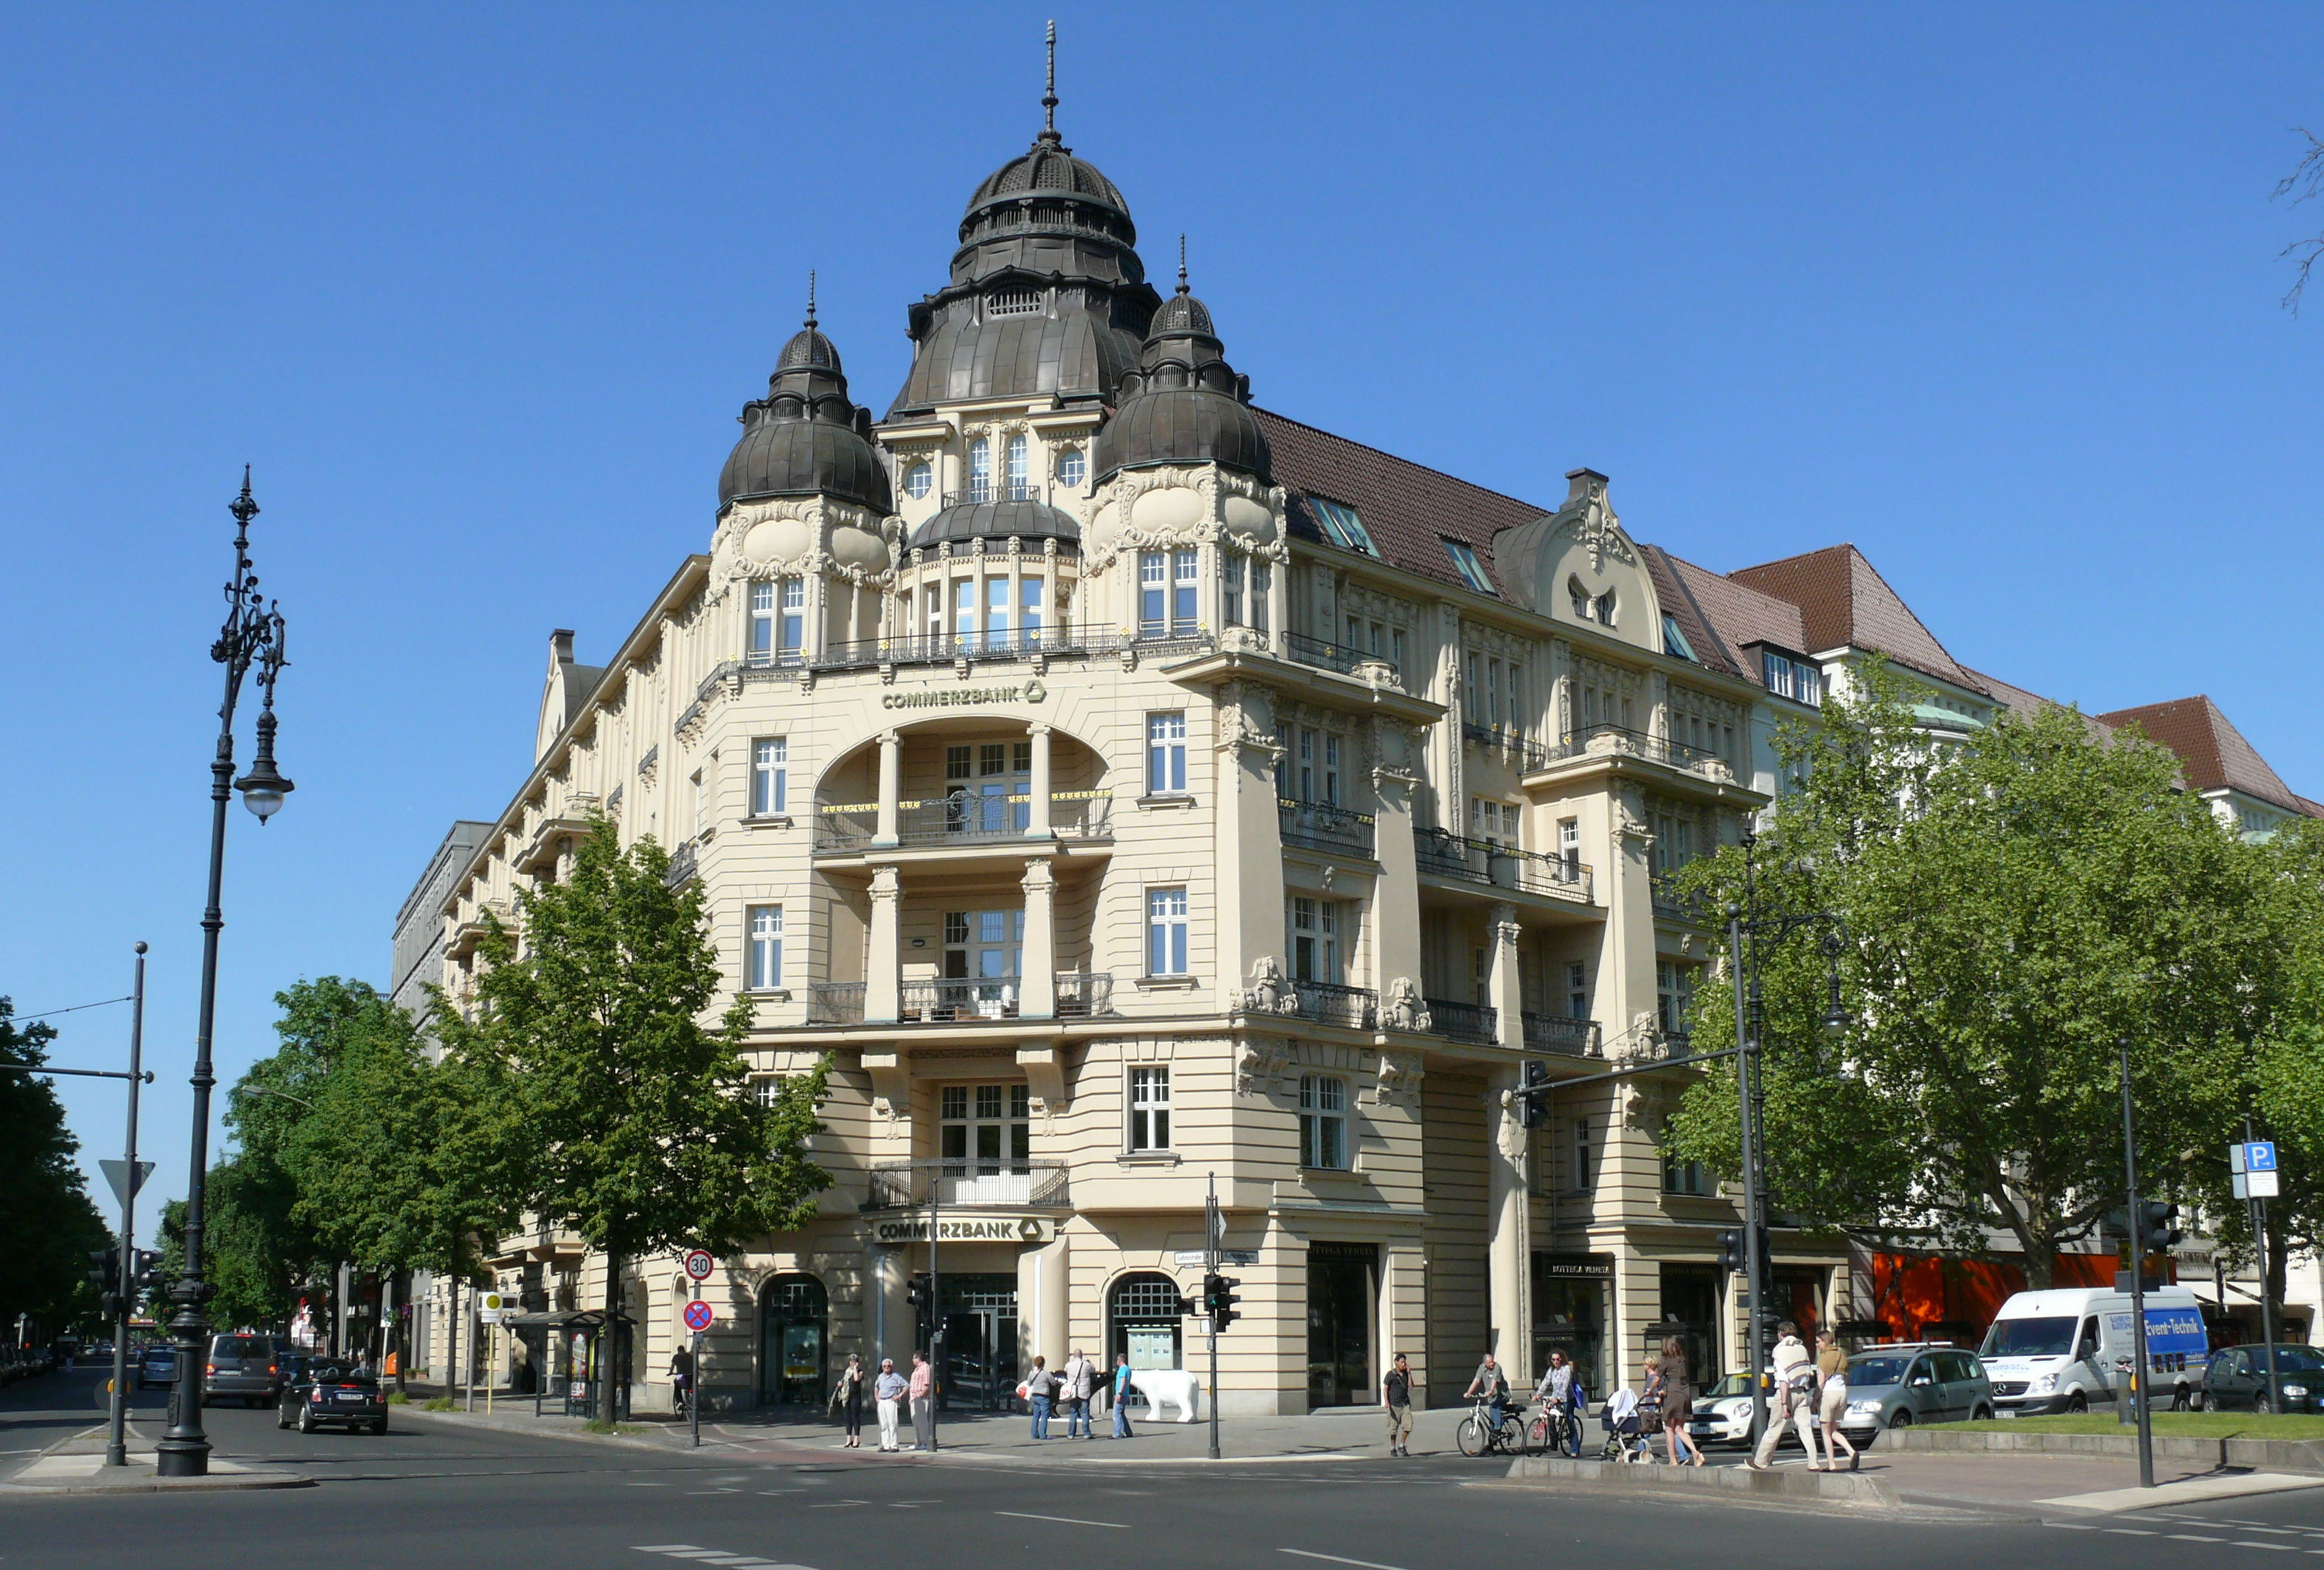 Scandic Hotel Berlin Potsdamer Platz